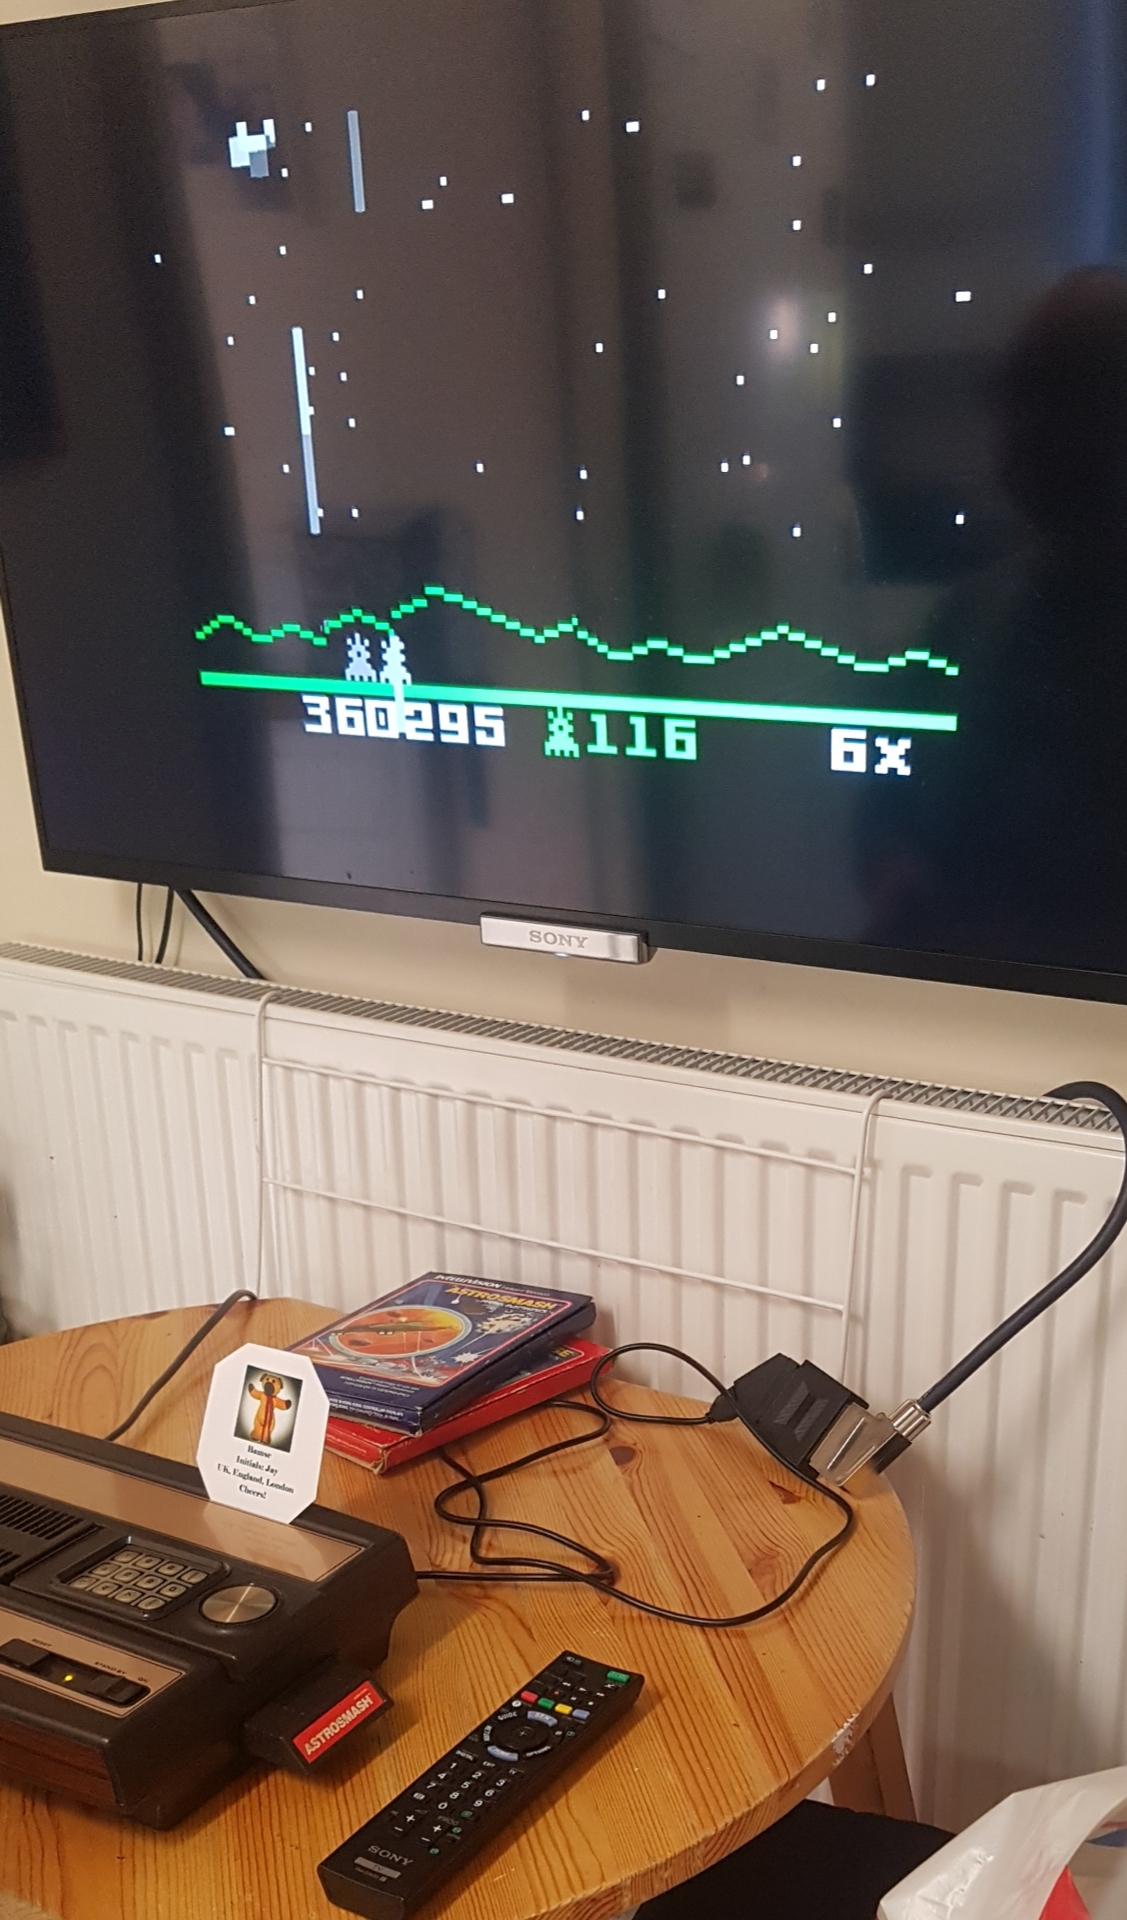 Astrosmash [Peak Score] 360,295 points